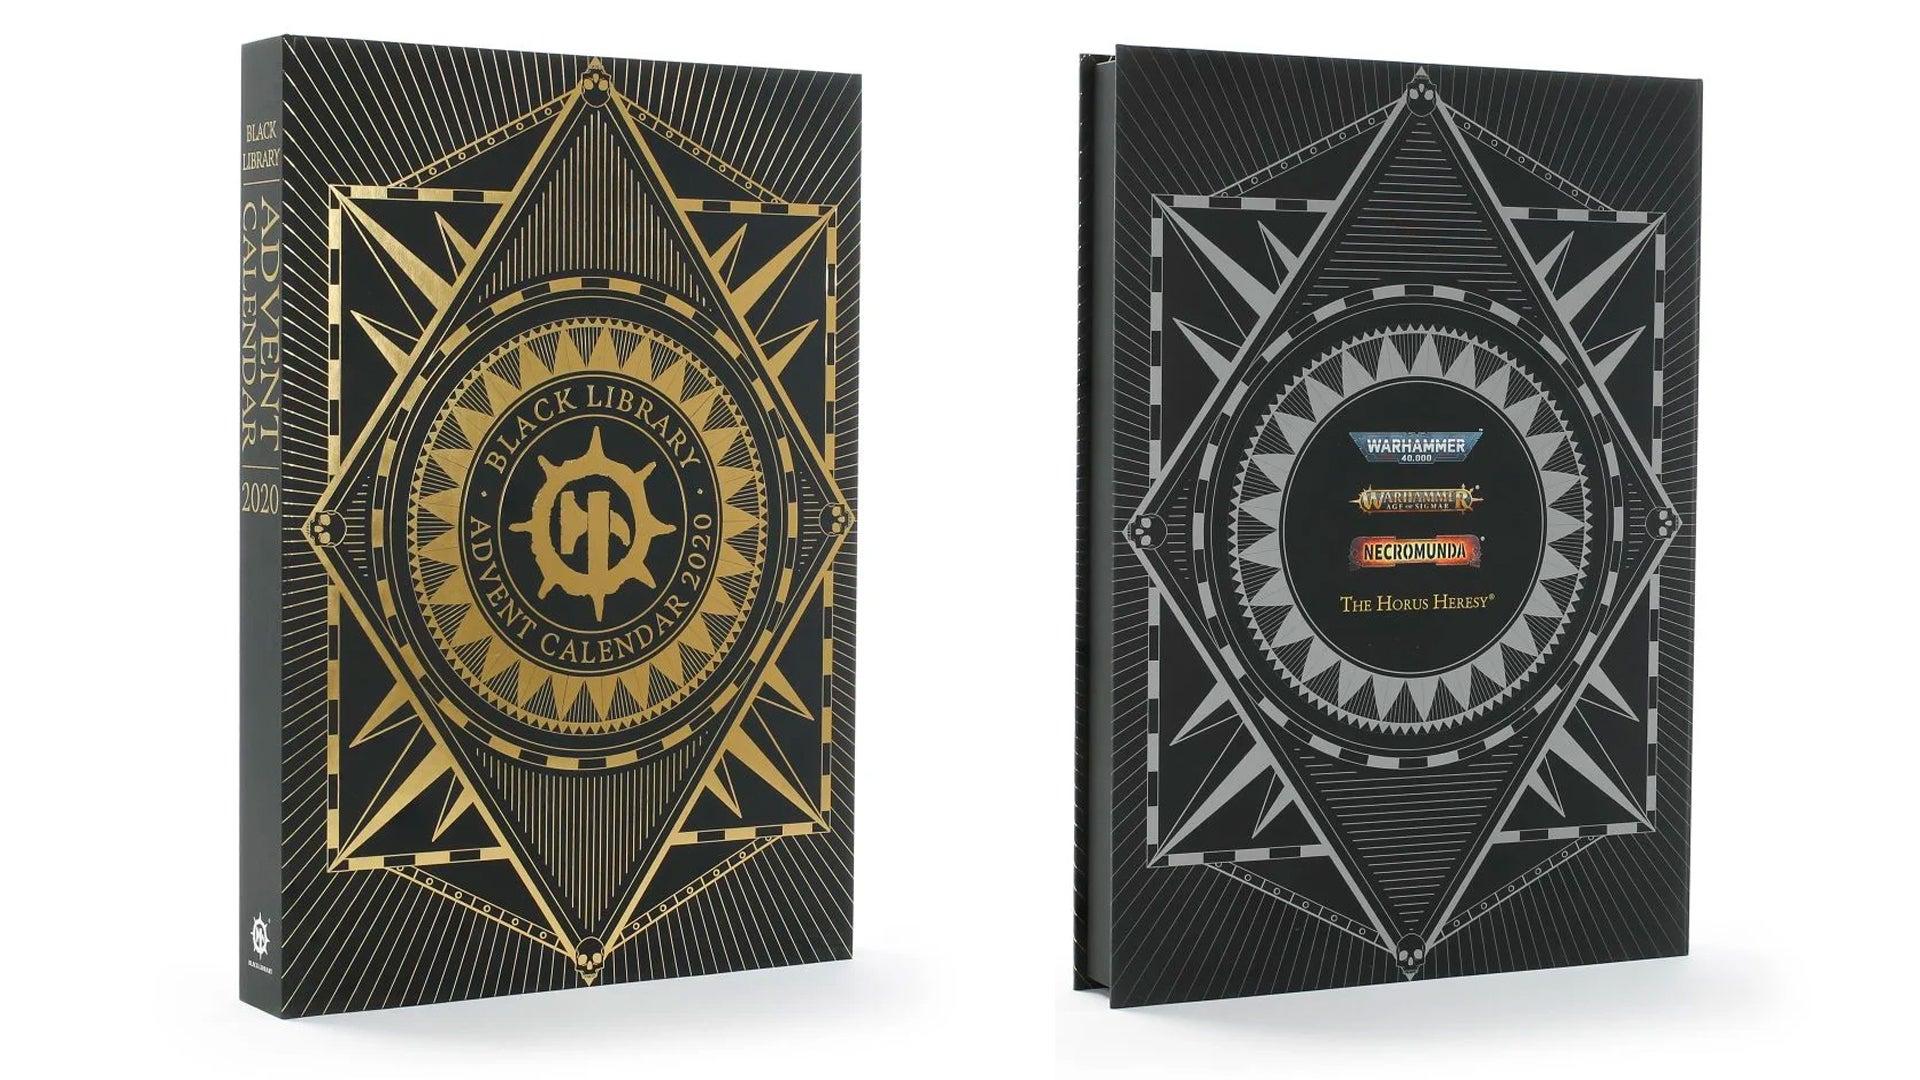 Black Library Advent Calendar 2020 box